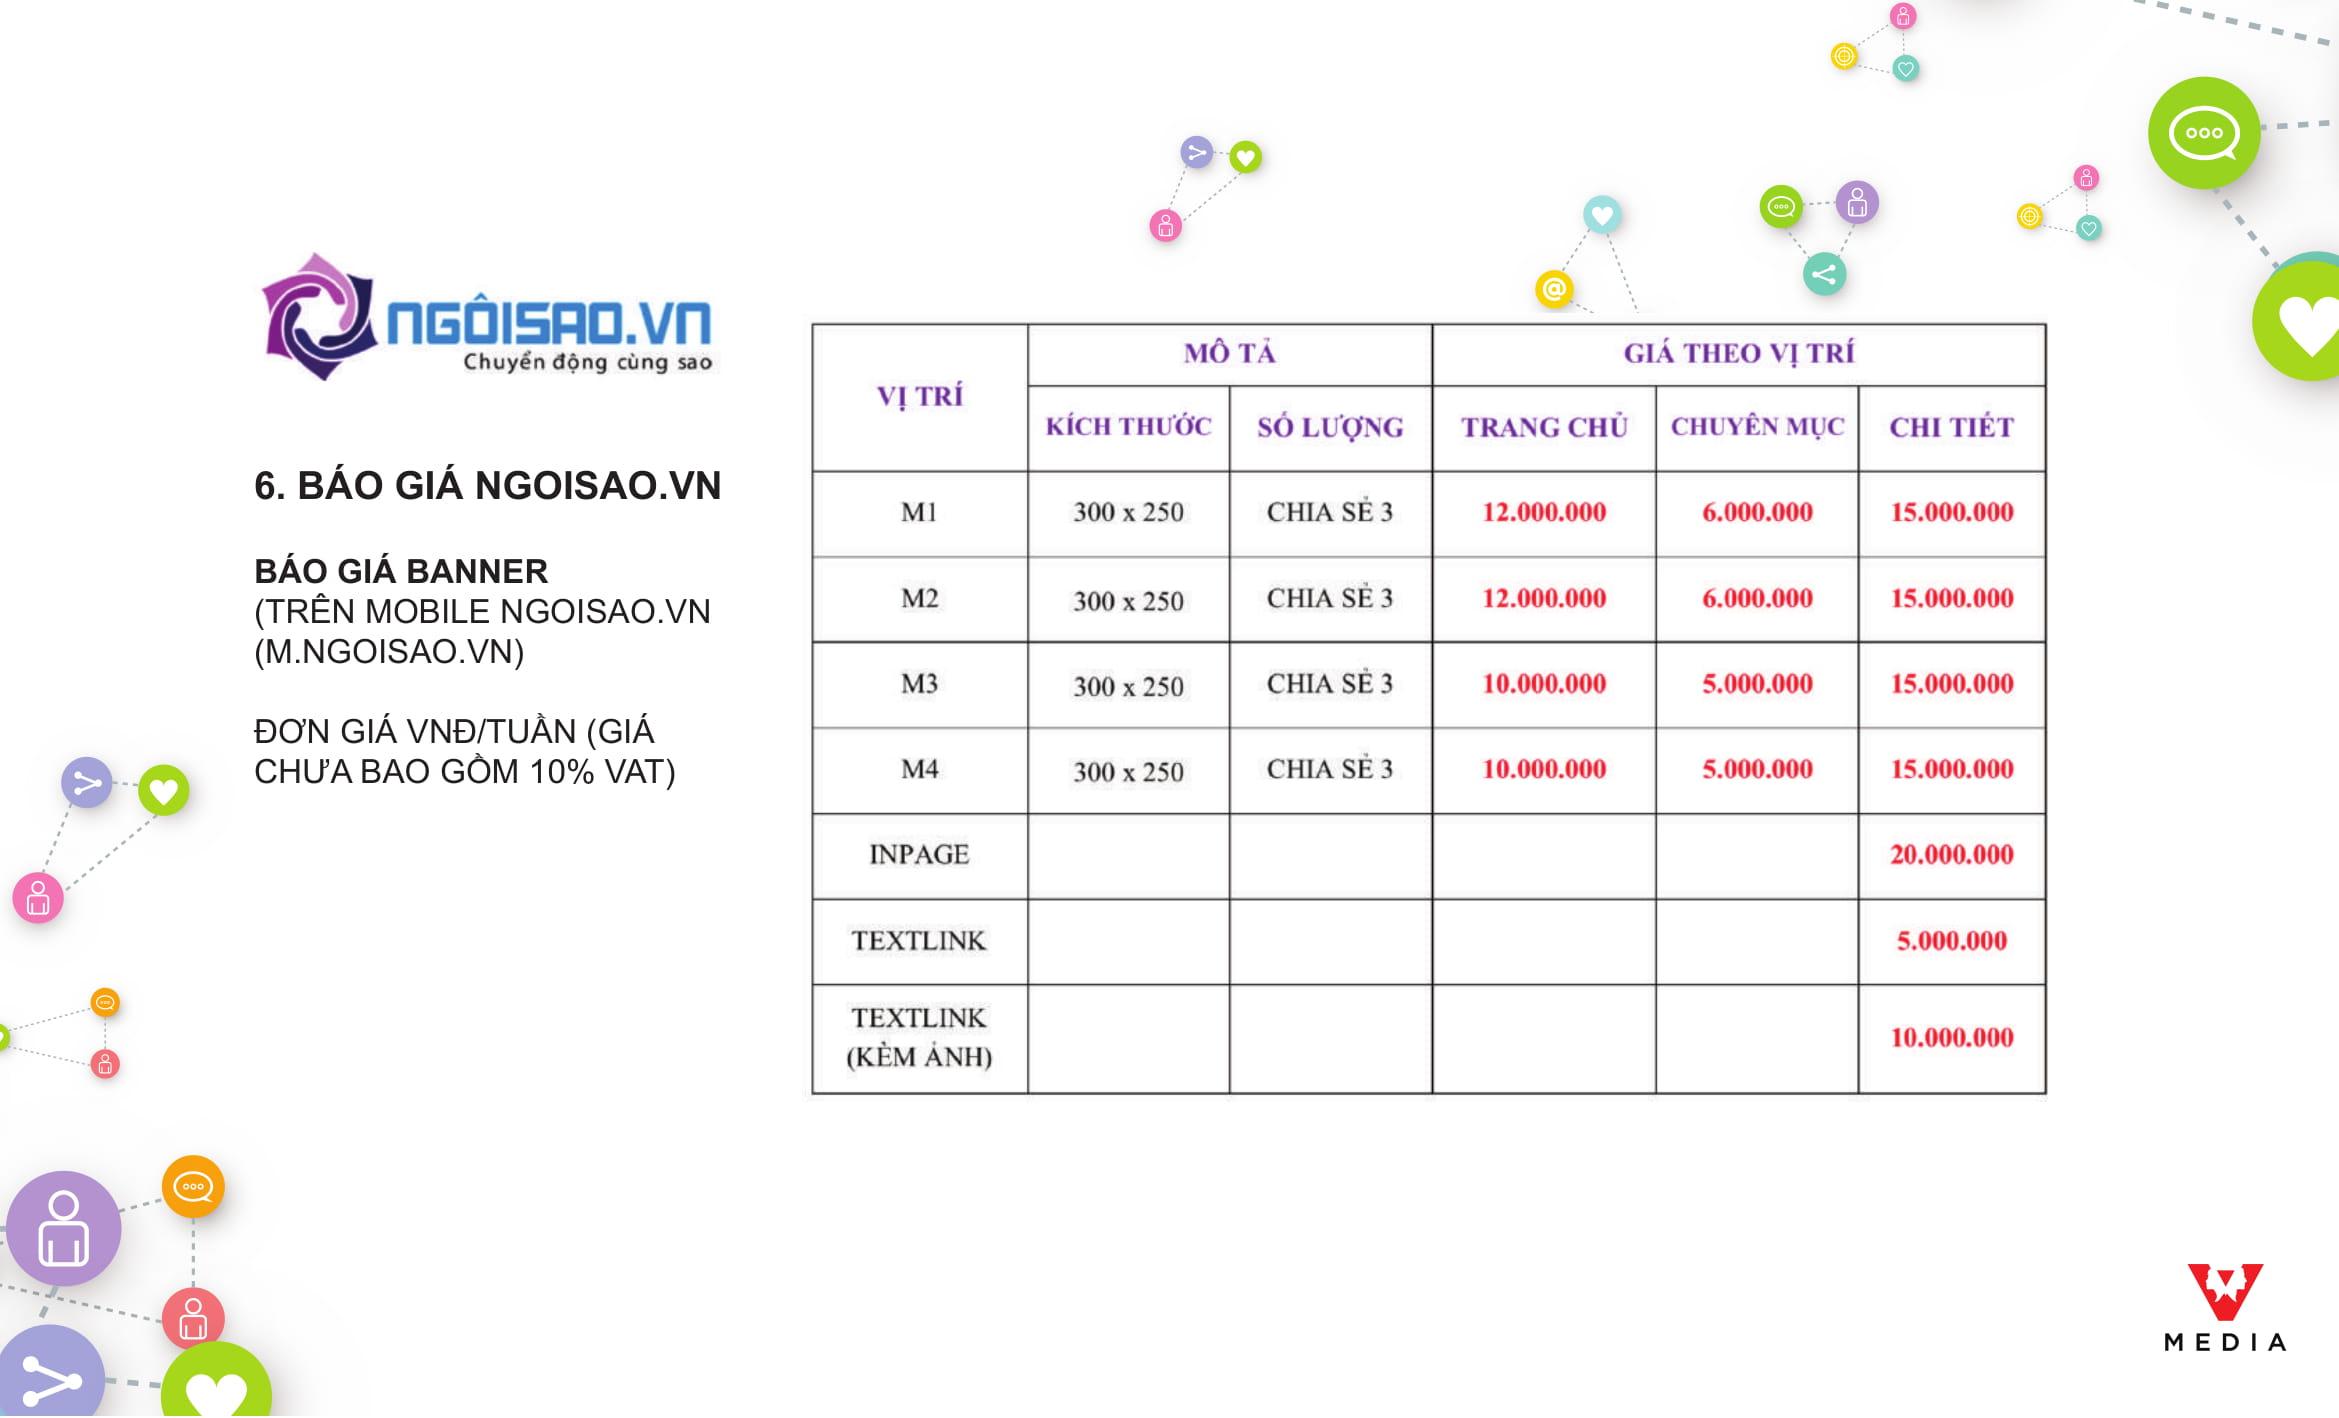 vmediaprensent-compressed-07-ngoisao.vn-w2339-h1418 8